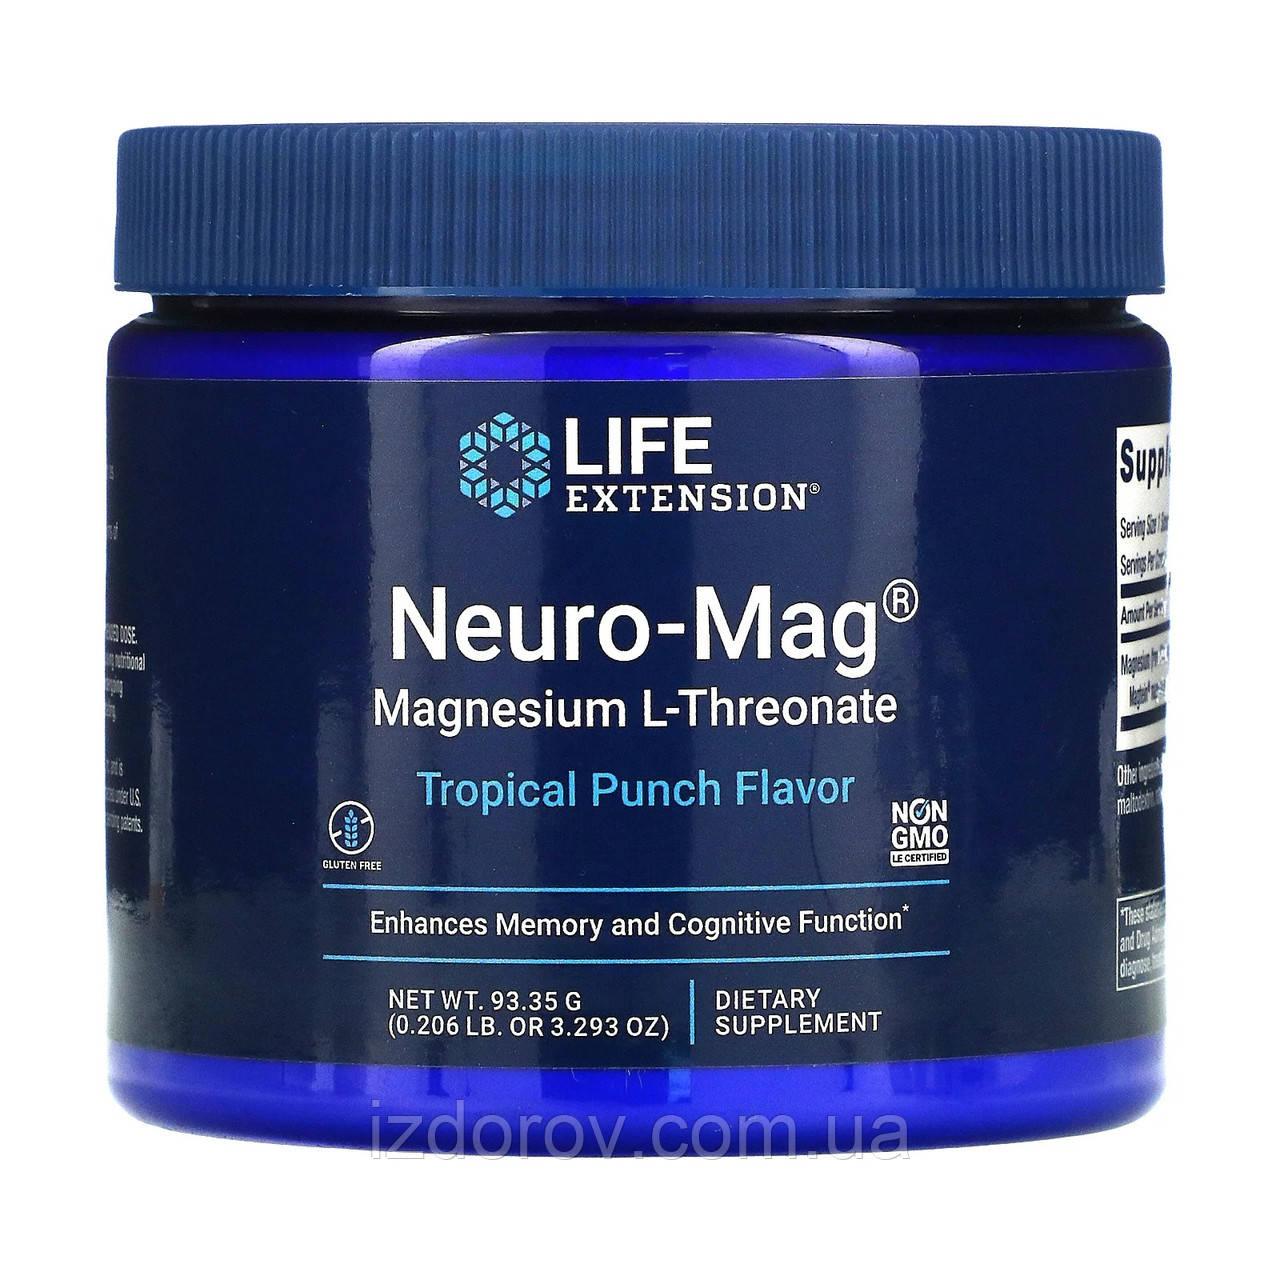 Life Extension, Neuro-Mag, Магний L-треонат, вкус тропического пунша, 93,35 г